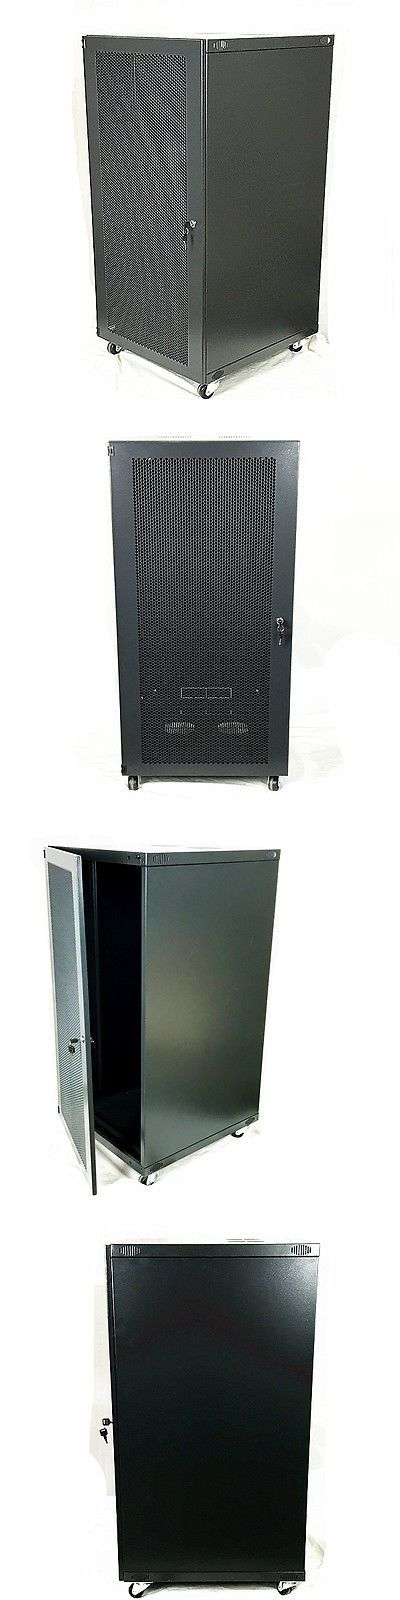 Rackmount Cabinets And Frames 51199 22u Wall Mount Network Server Cabinet Rack Enclosure Mesh Door Lock 600mm Deep Mesh Door Server Cabinet Wall Mount Rack